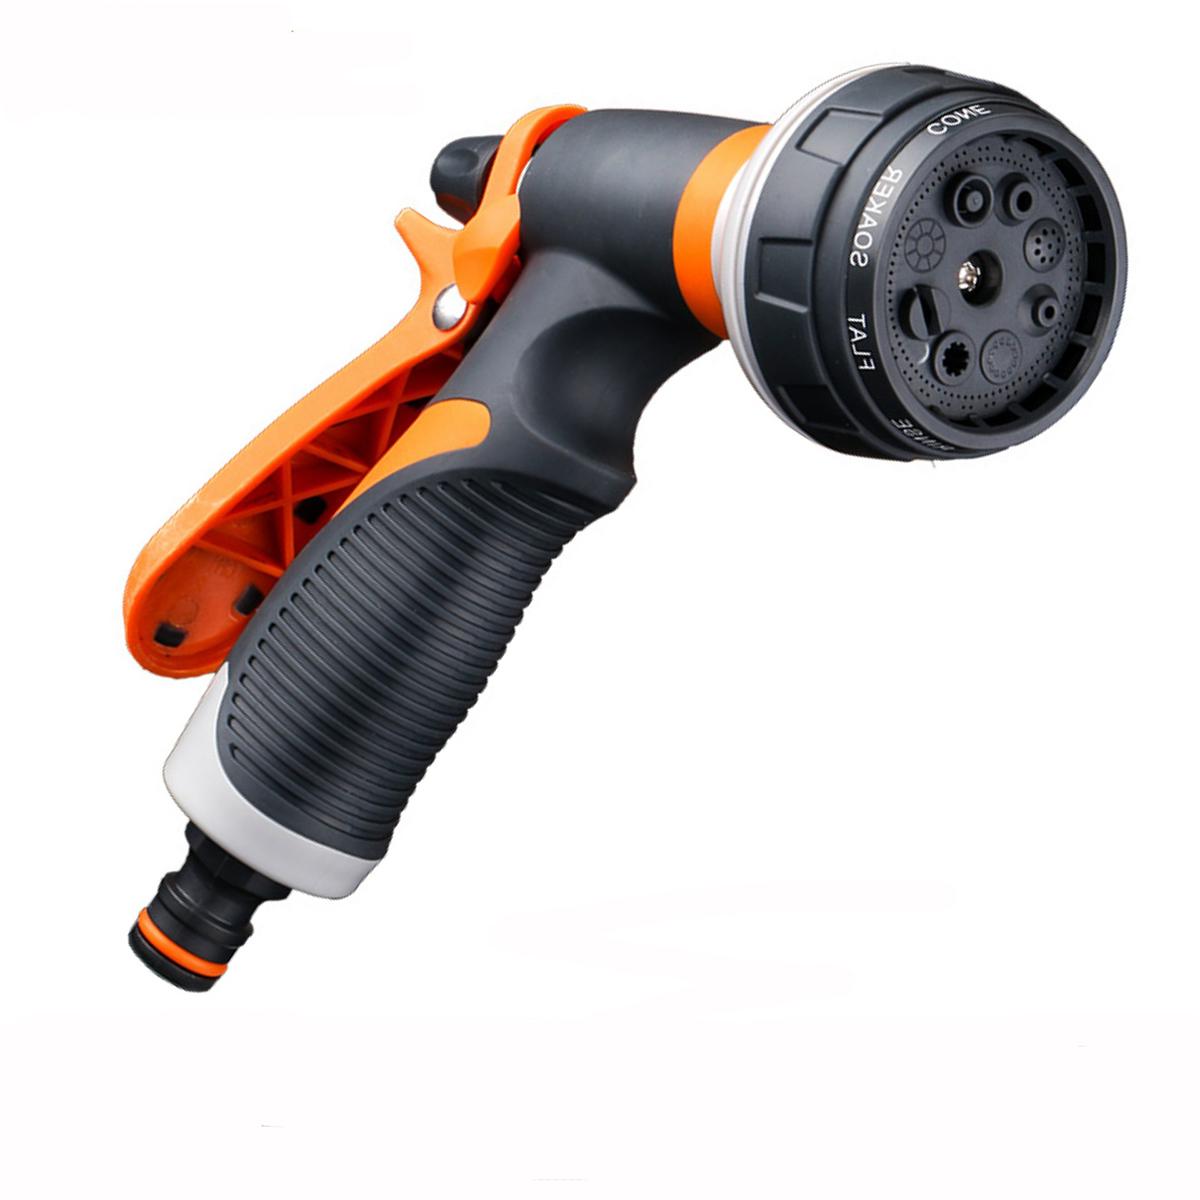 Garden Water Gun Irrigation Hose Nozzle Sprayer 8 Pattern Adjustable Cleaning Car Washing Sprinkler